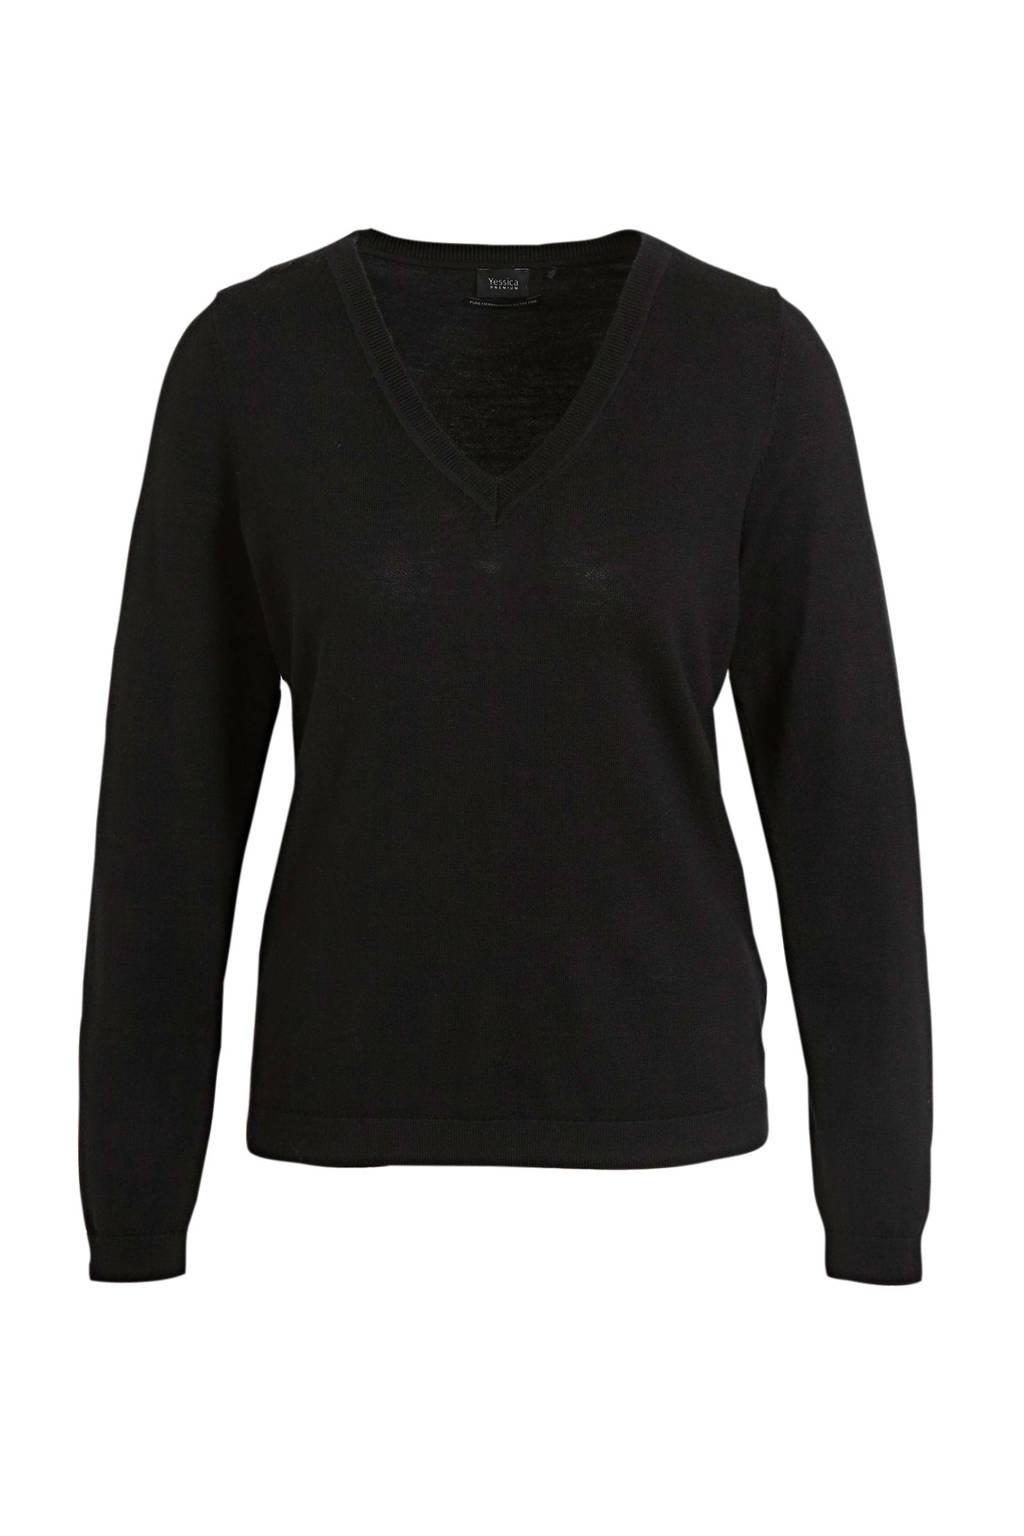 C&A fijngebreide wollen trui zwart, Zwart